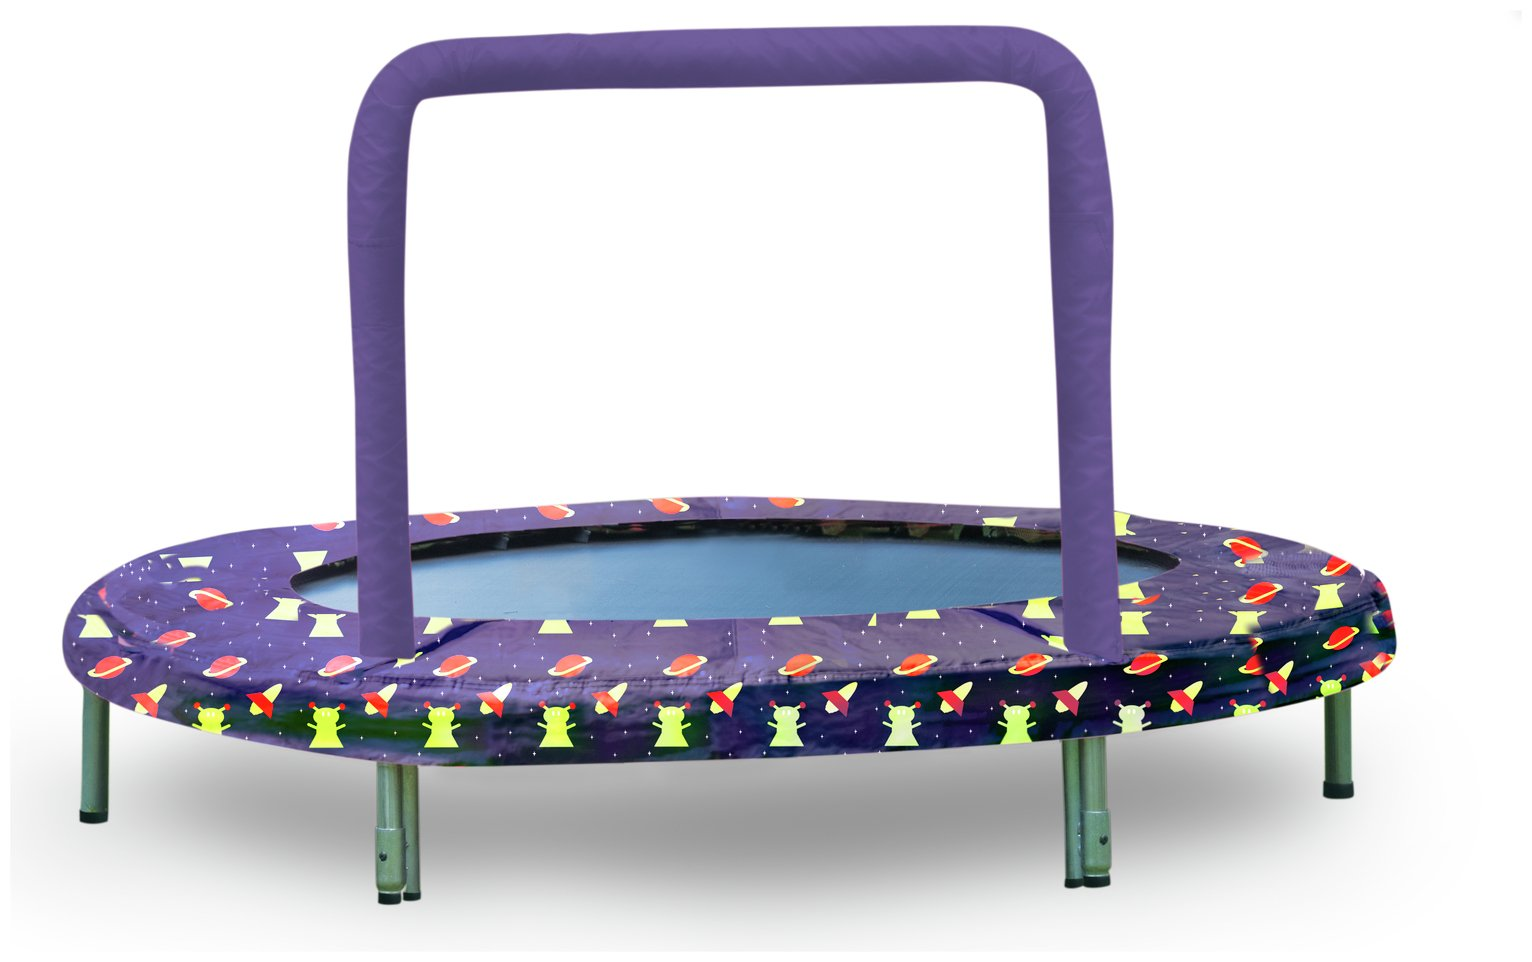 Bazoongi Space Mini Bouncer Trampoline